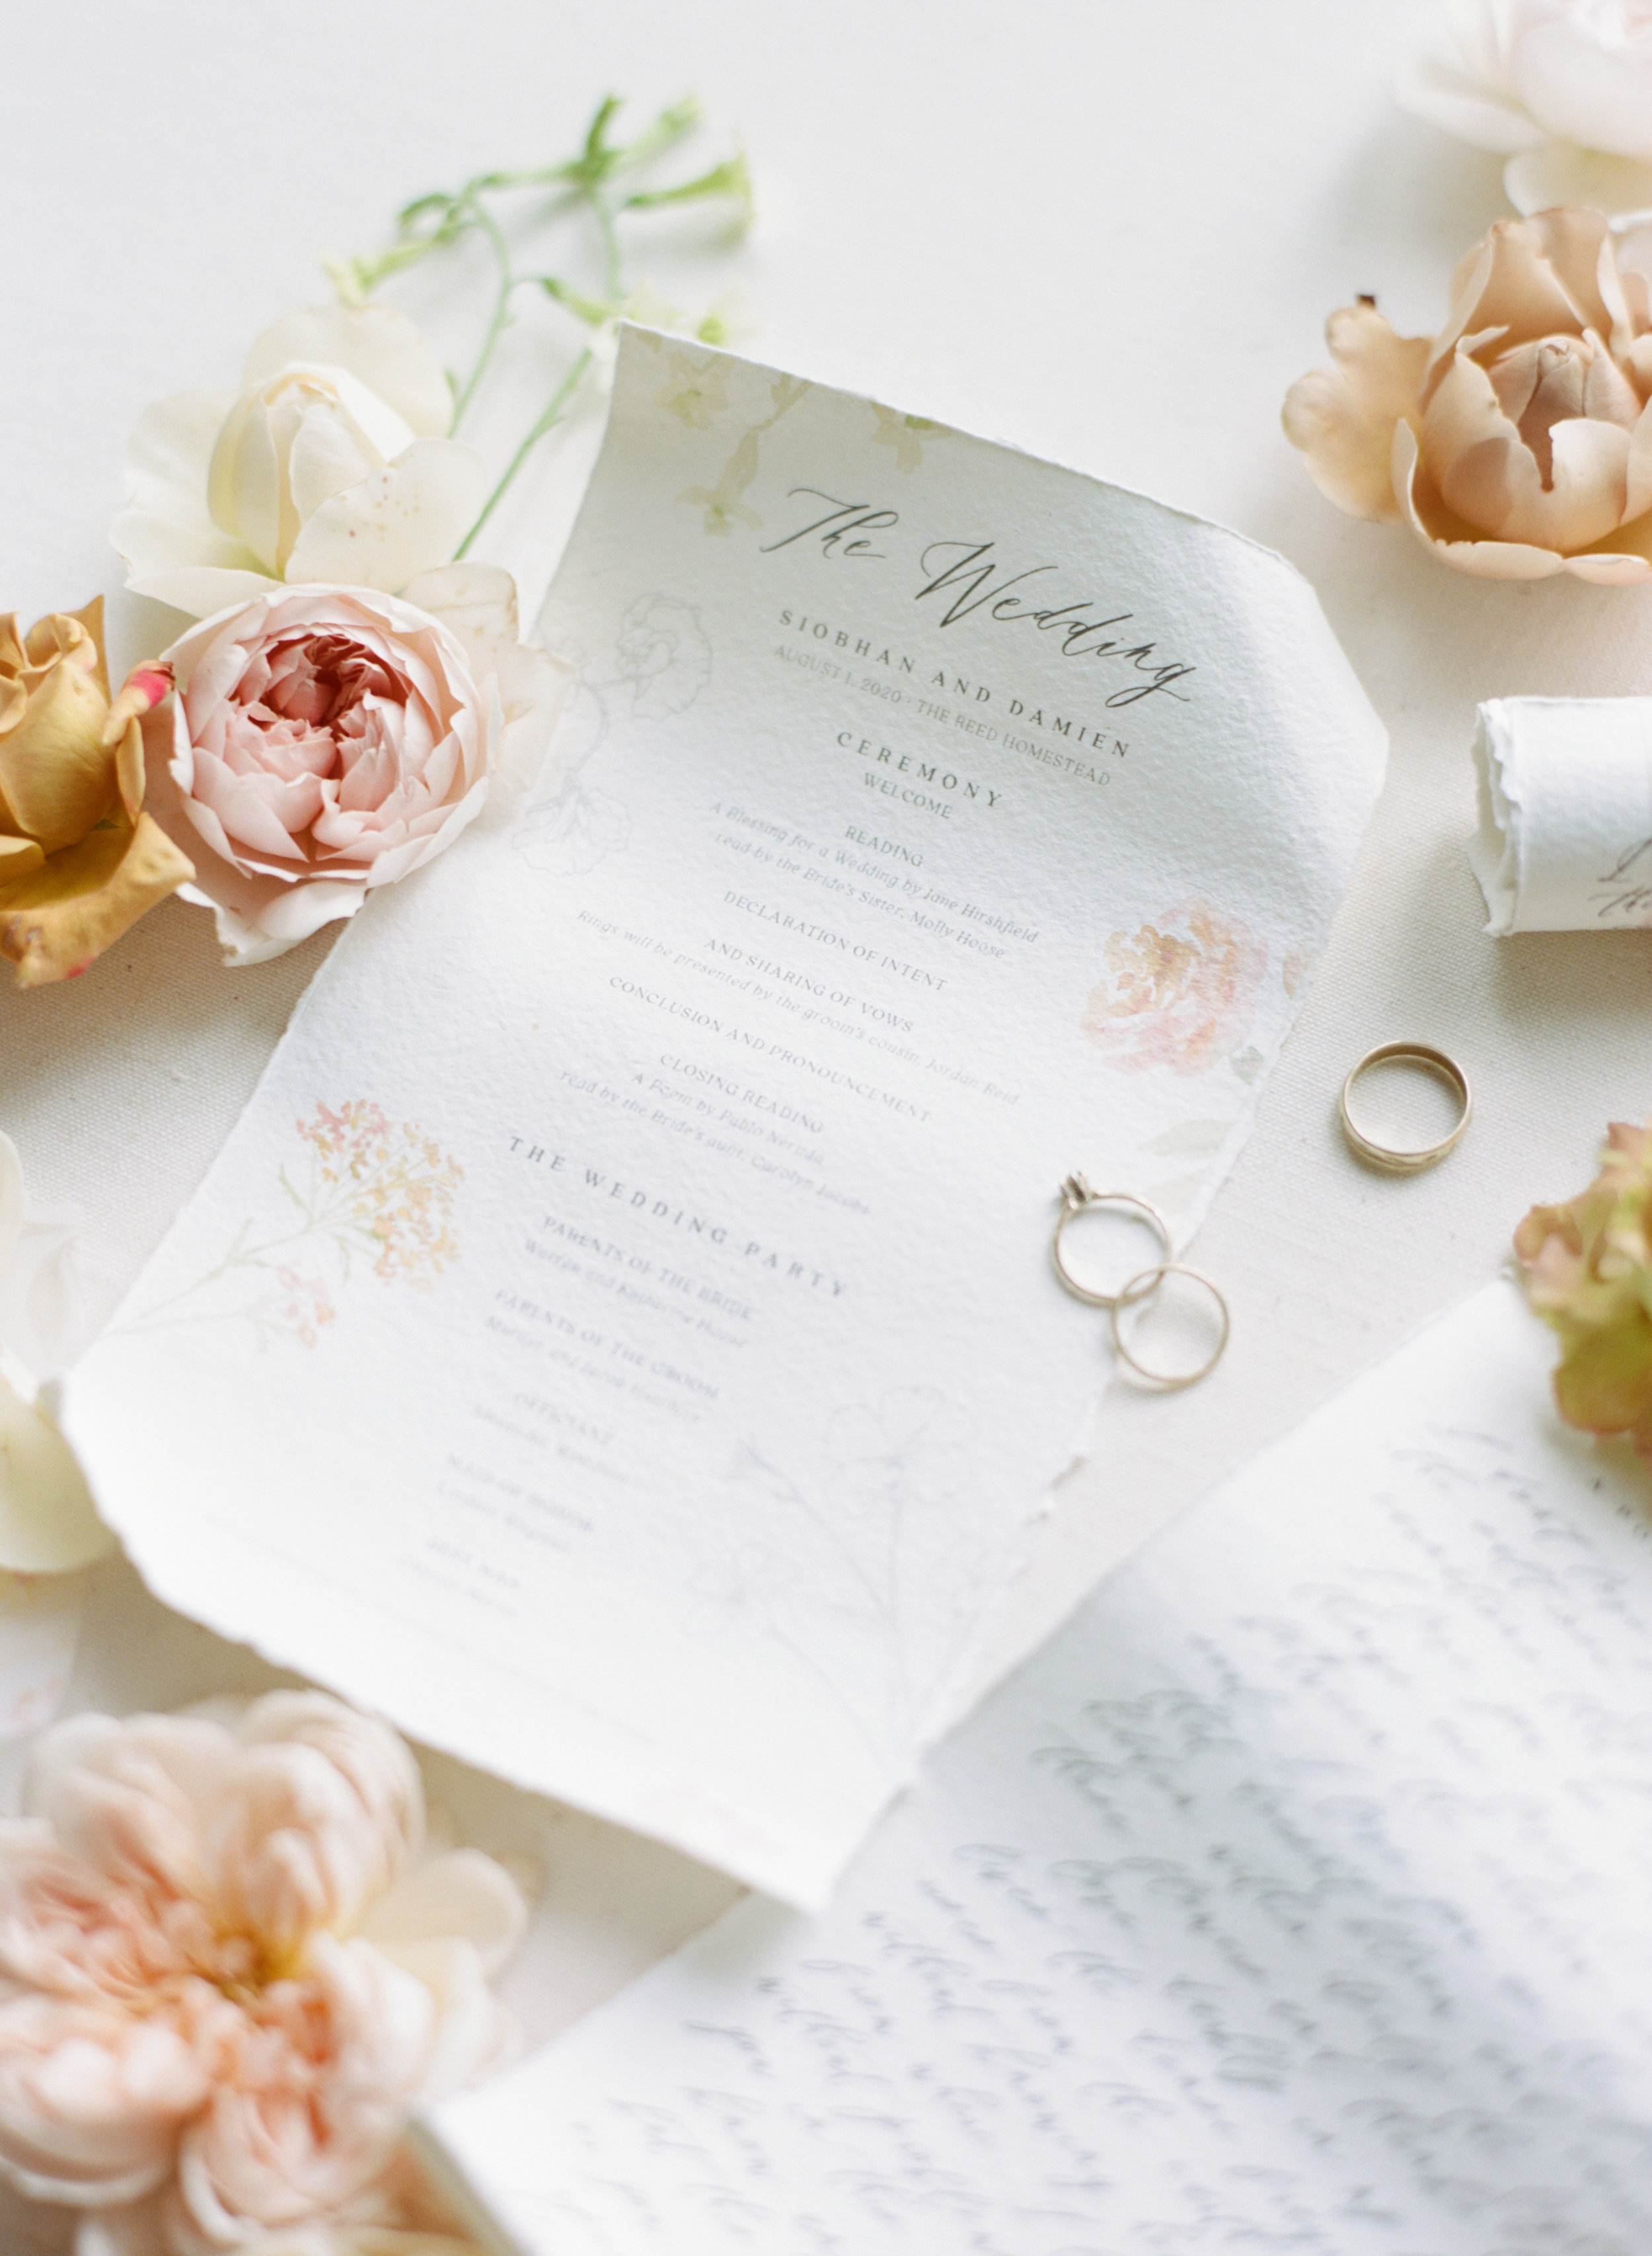 alexandra-meseke-understated-soft-luxury-wedding-upstate-ny_0024.jpg